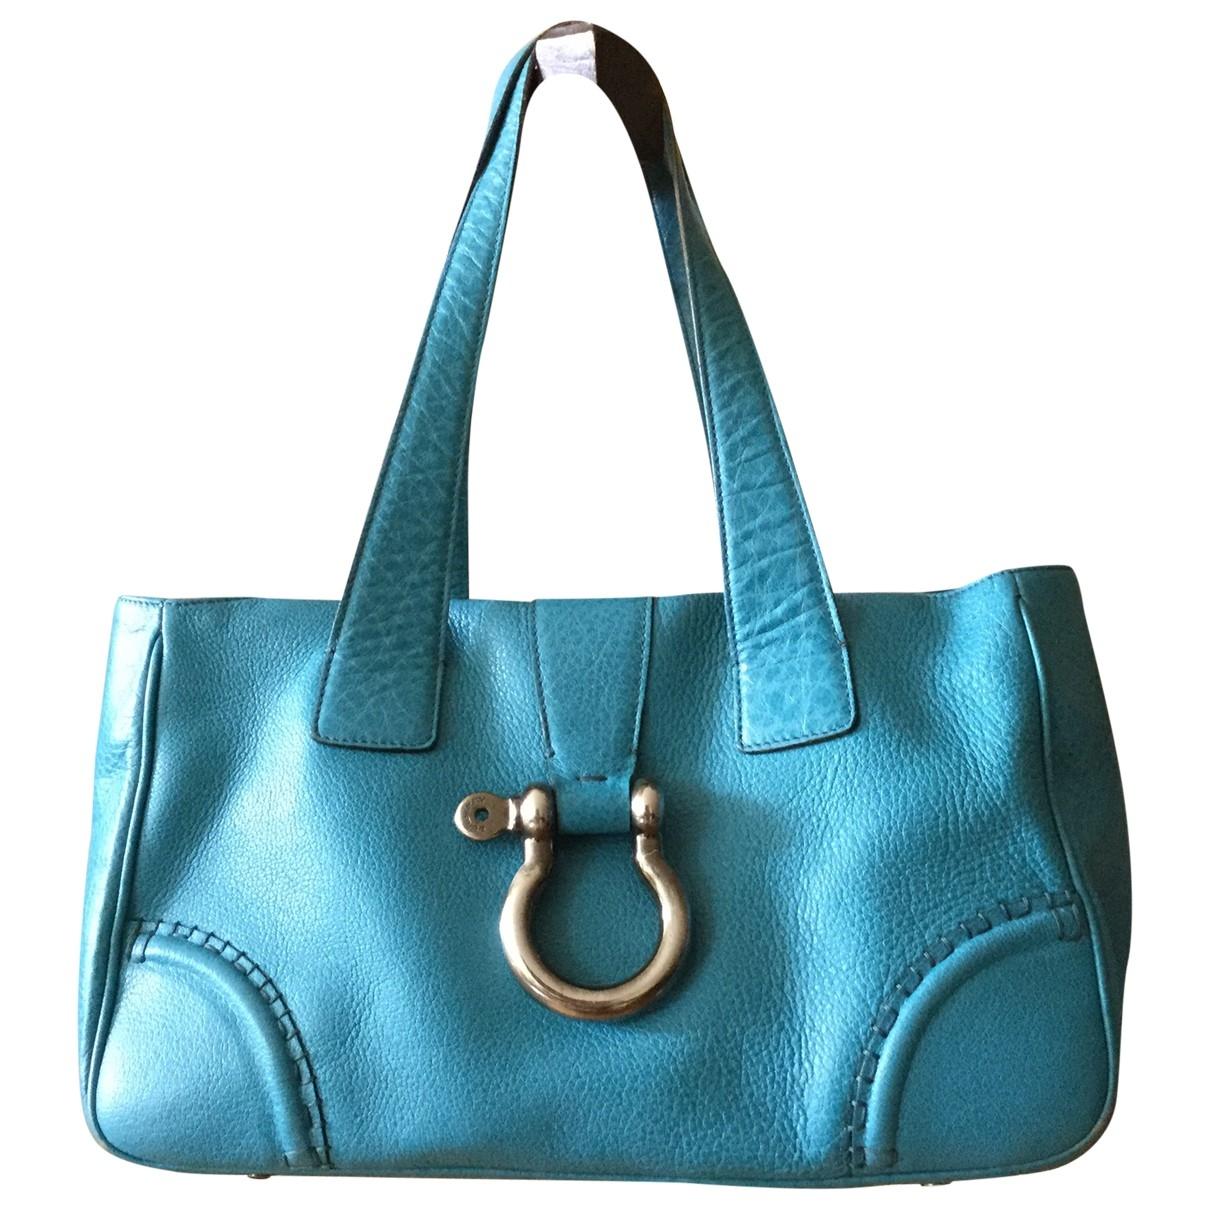 Burberry \N Turquoise Leather handbag for Women \N